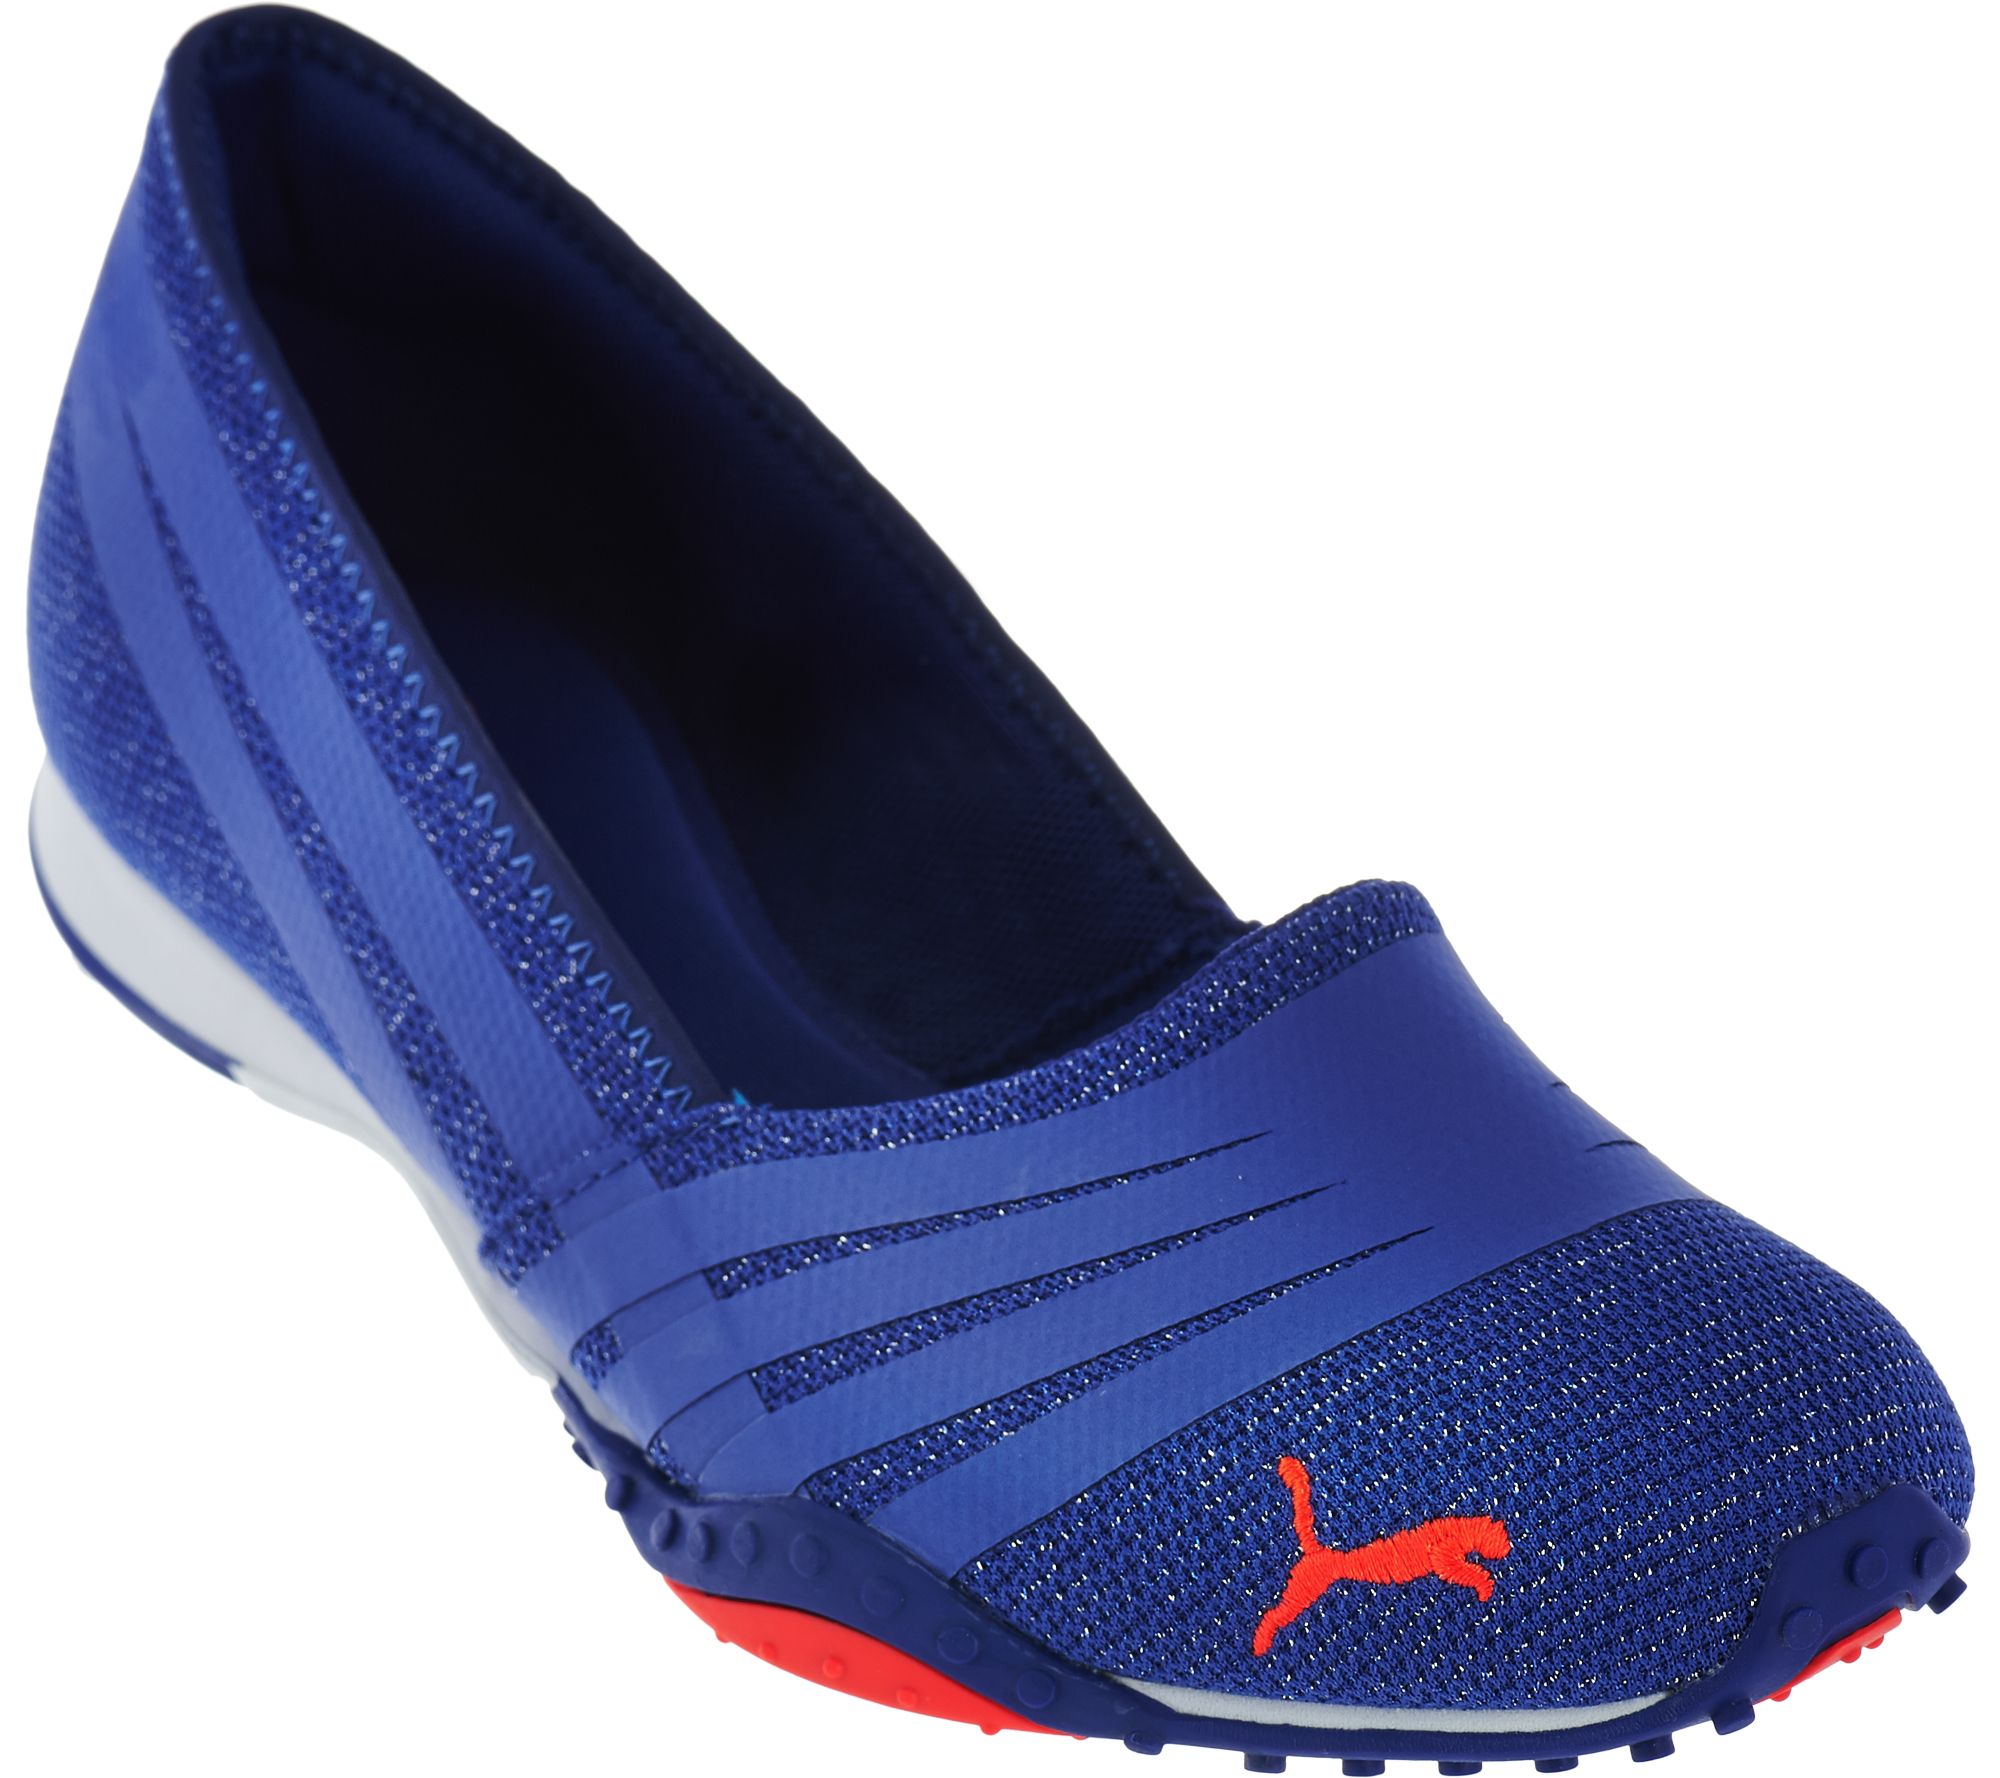 PUMA Form Fitting Slip-on Sneakers - Asha Alt 2 - Page 1 — QVC.com c0f07bfca